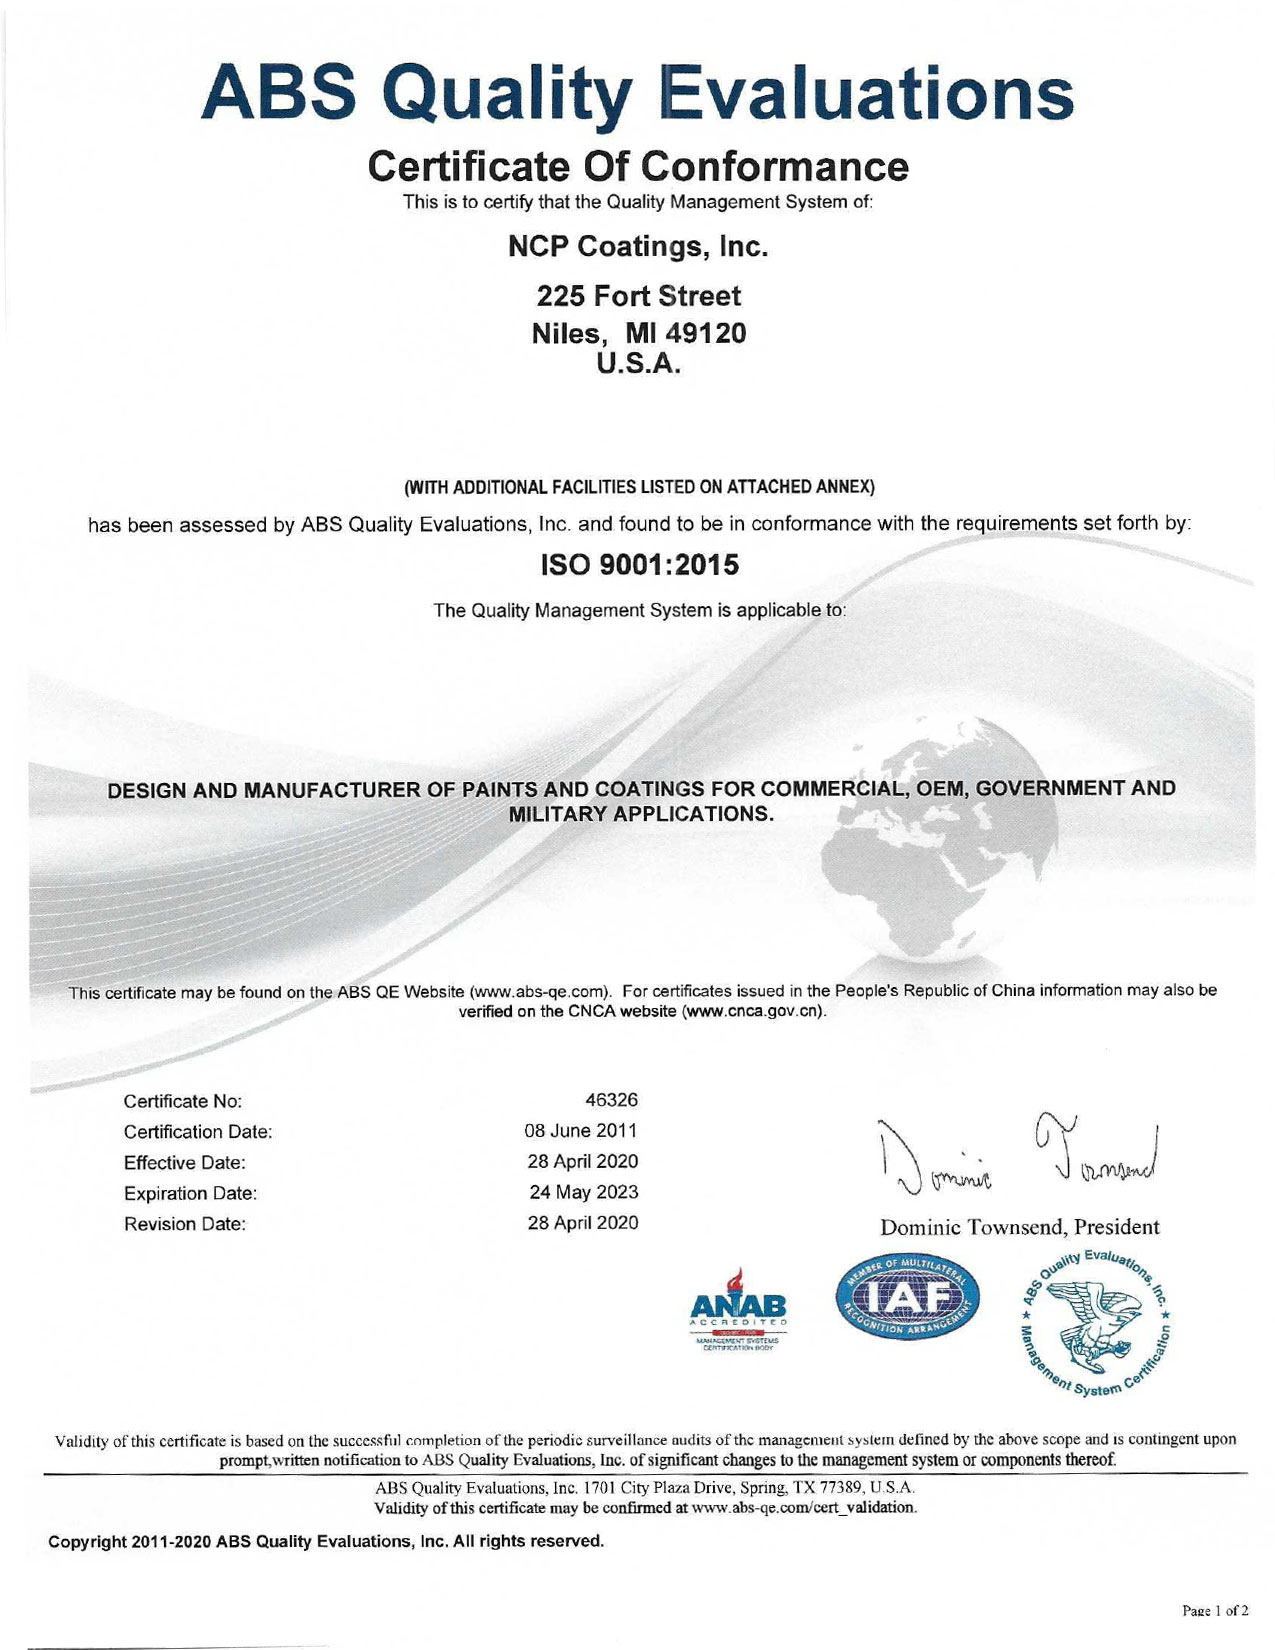 NCP ISO 9001 2015 rev April 2020 p 1